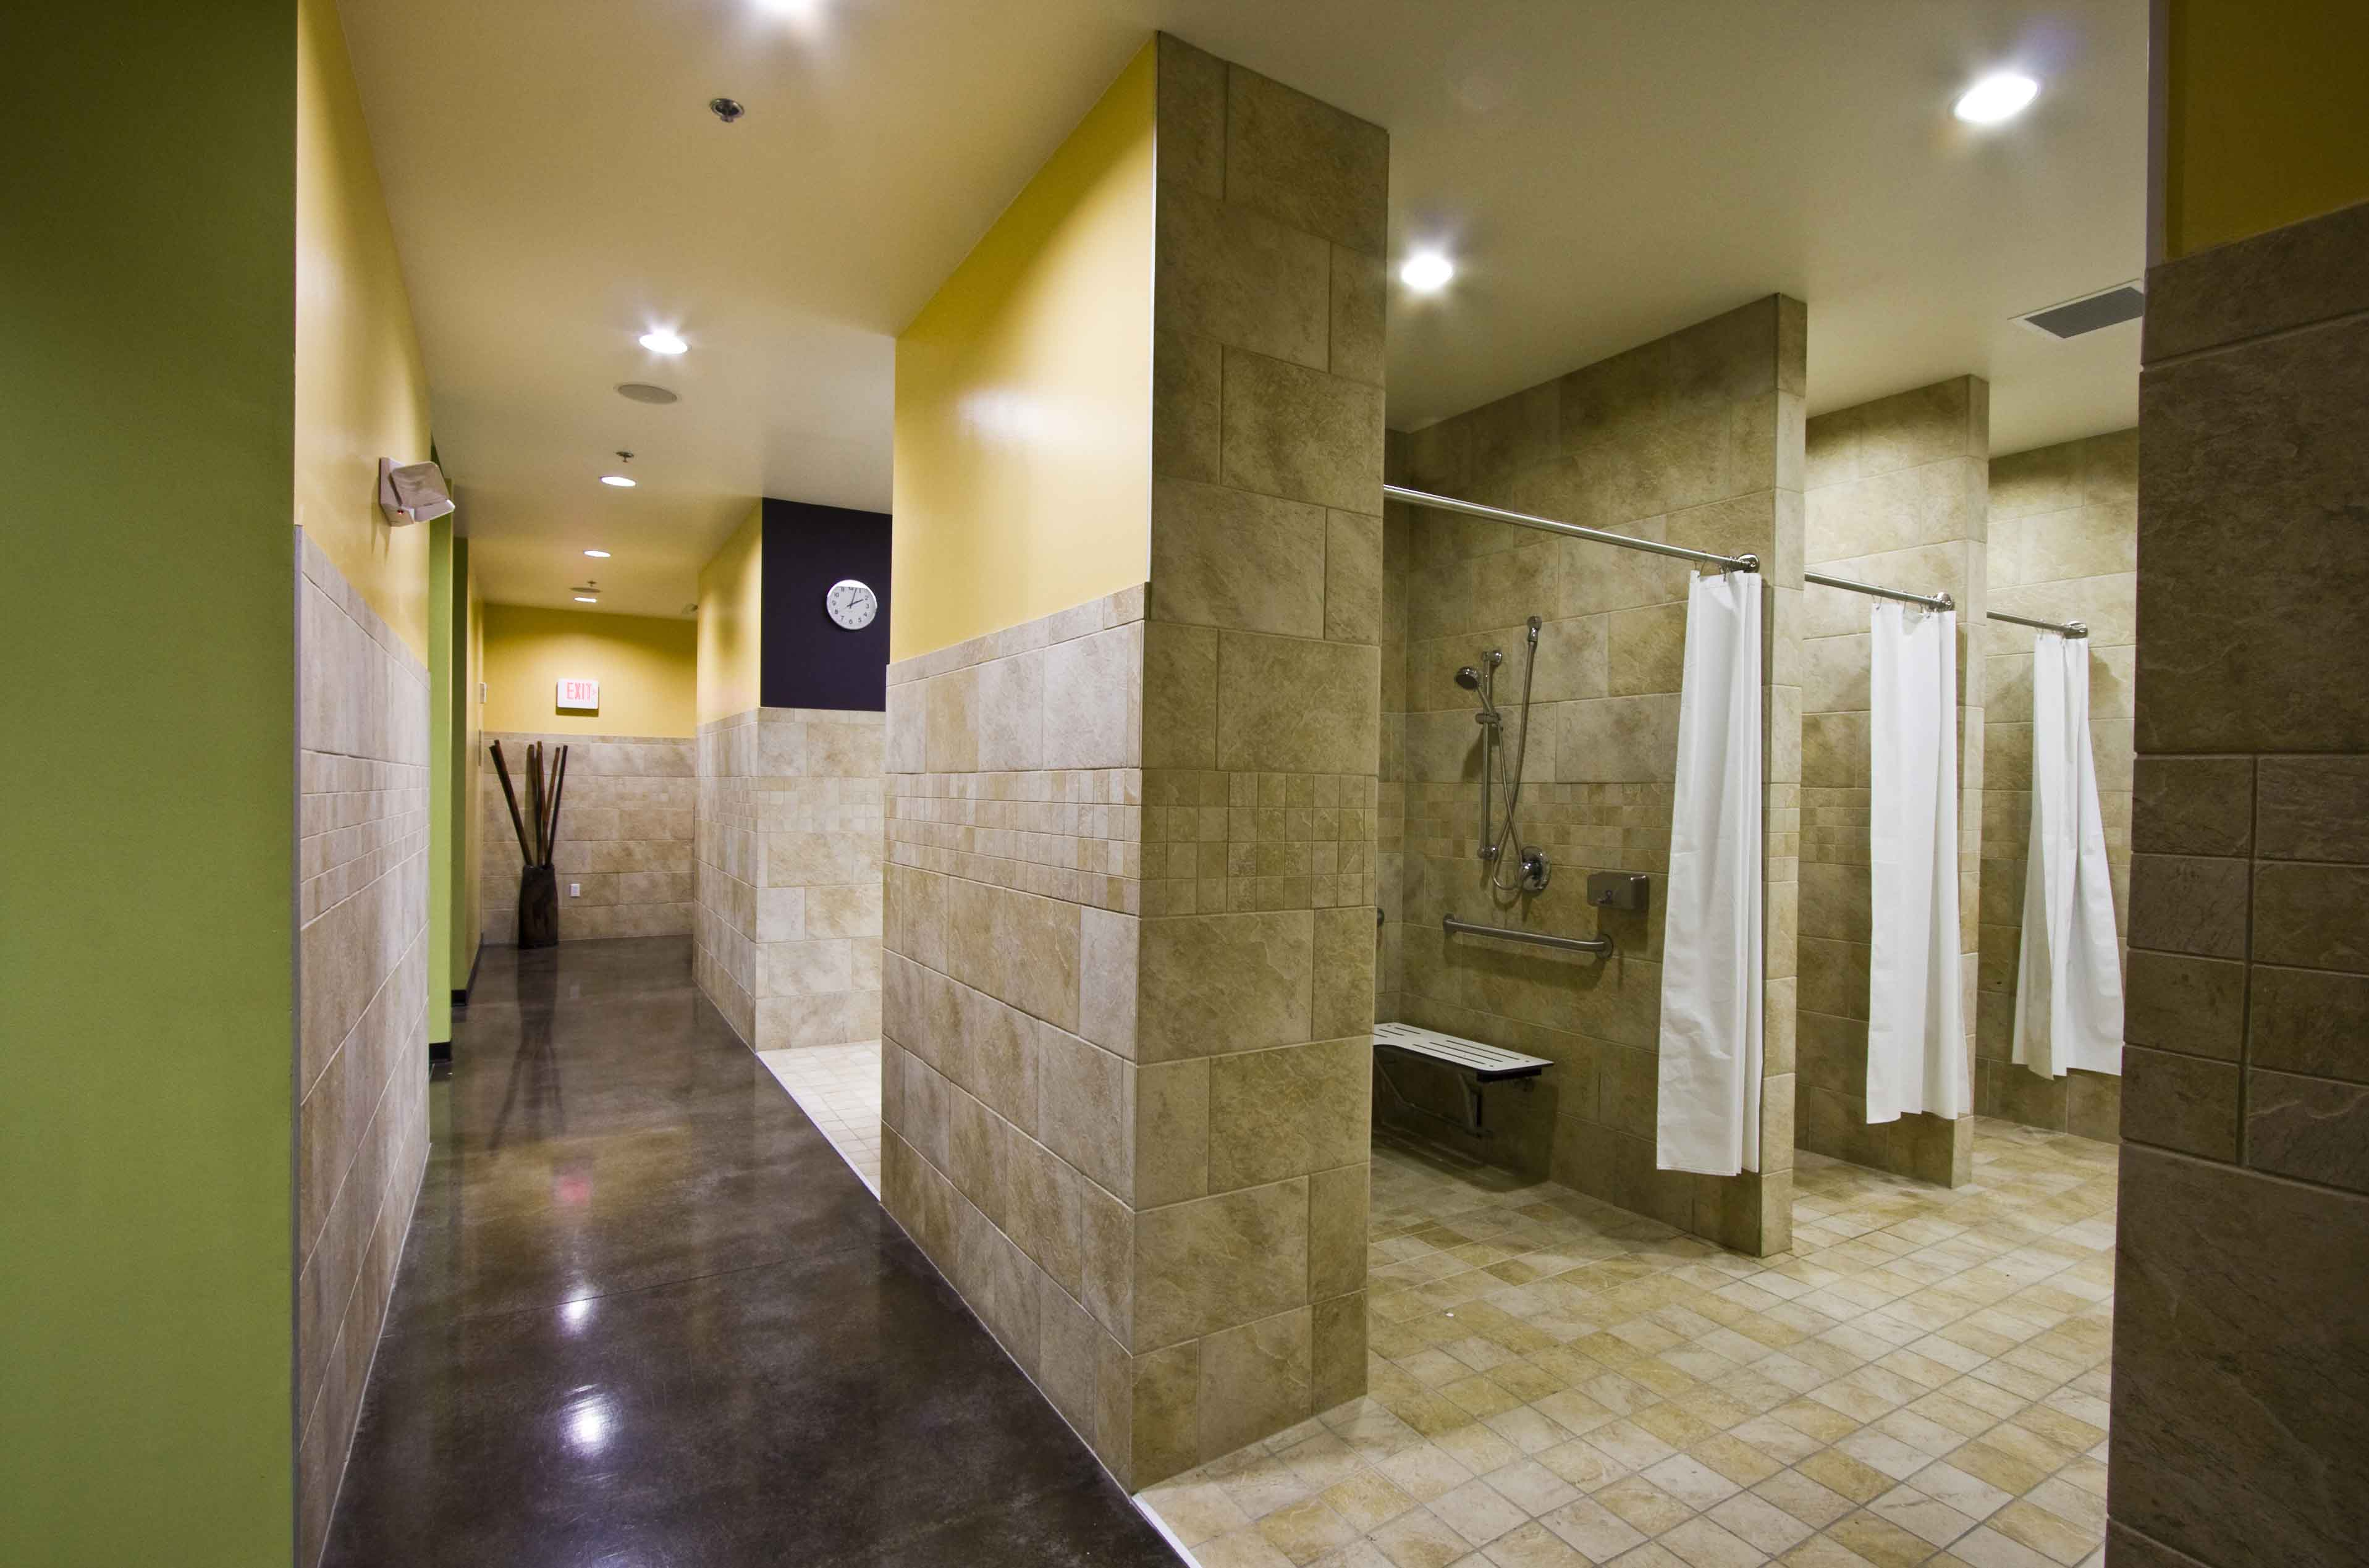 A little bathroom architectural photographs